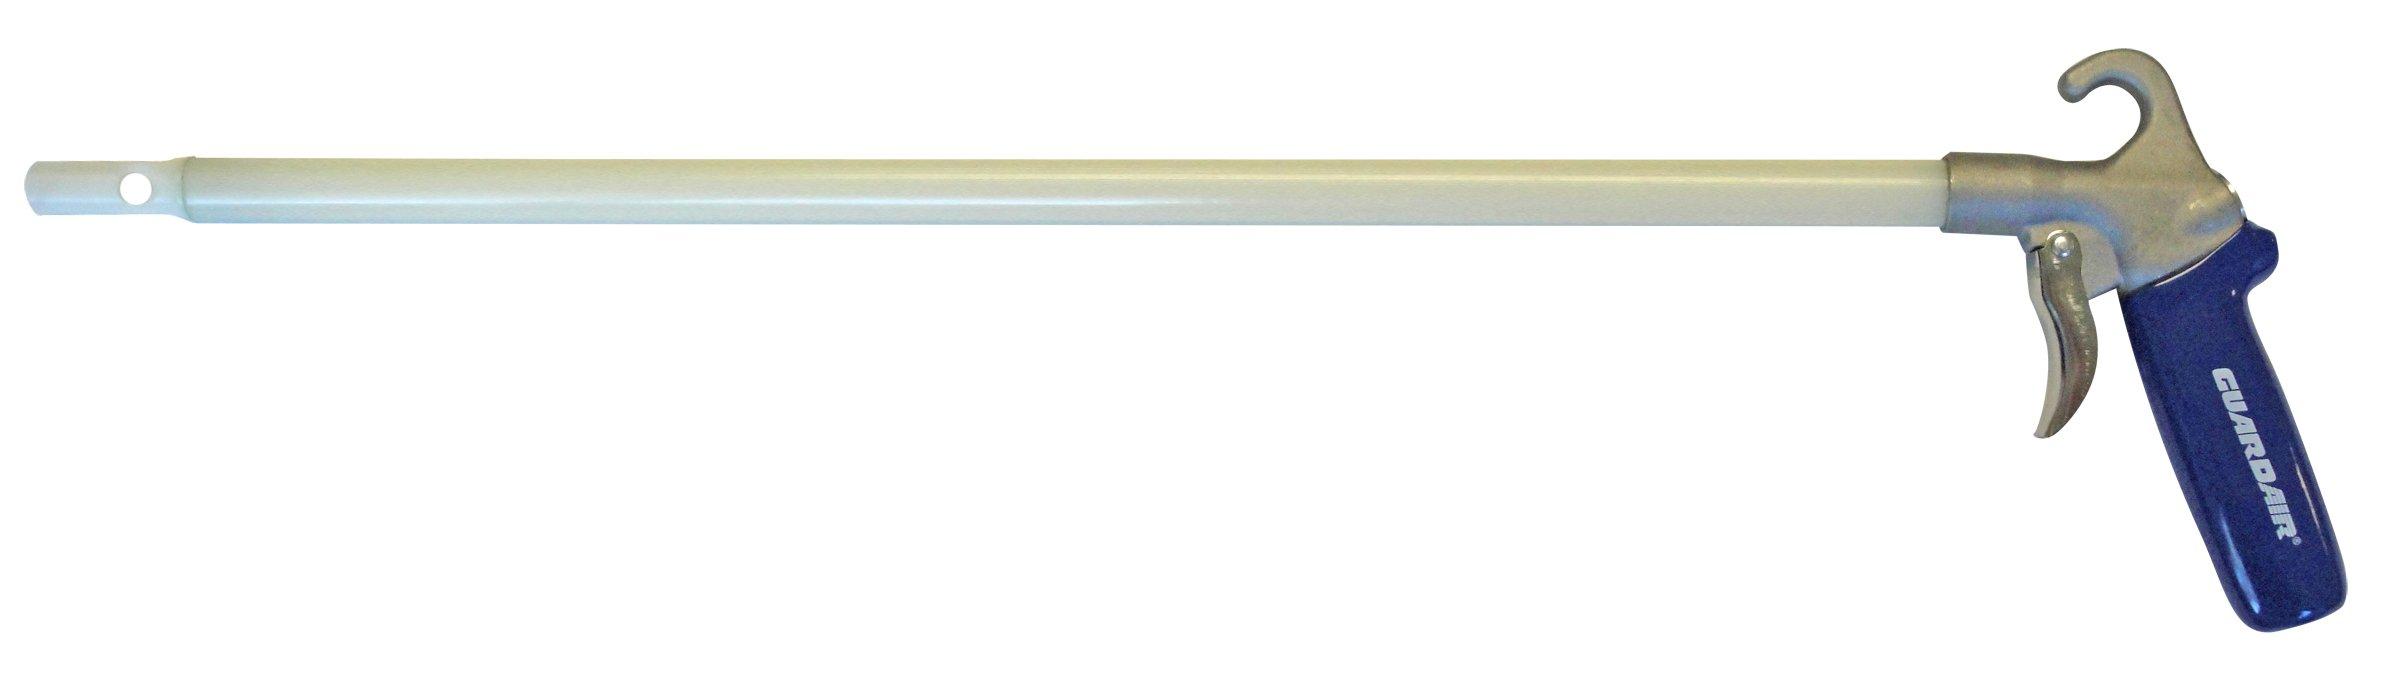 Guardair 75LJ024NN Long John Non-Conductive Safety Air Gun with 24-Inch Nylon Extension and Nylon Nozzle